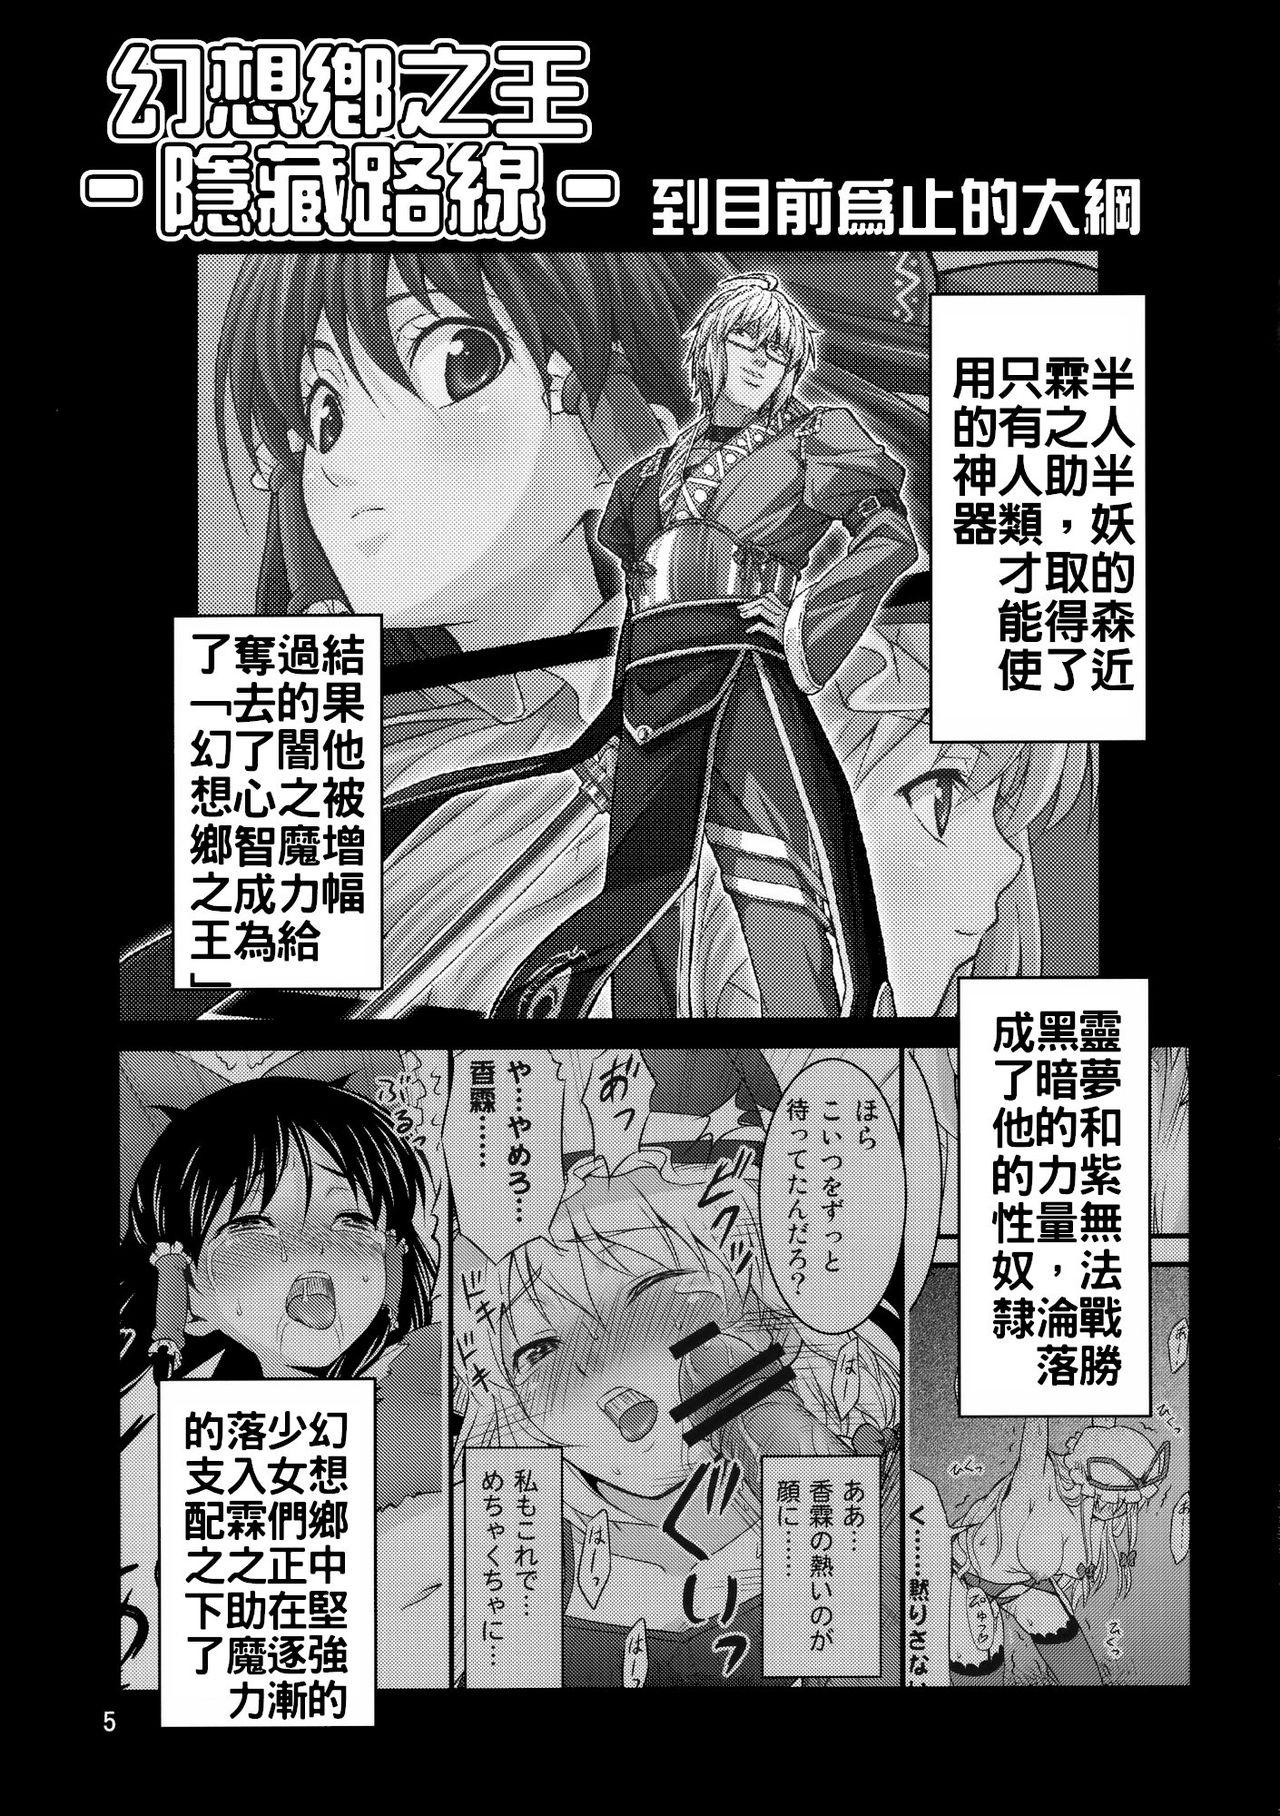 Gensoukyou no Ou Sanae Ryoujoku Hen 2 3